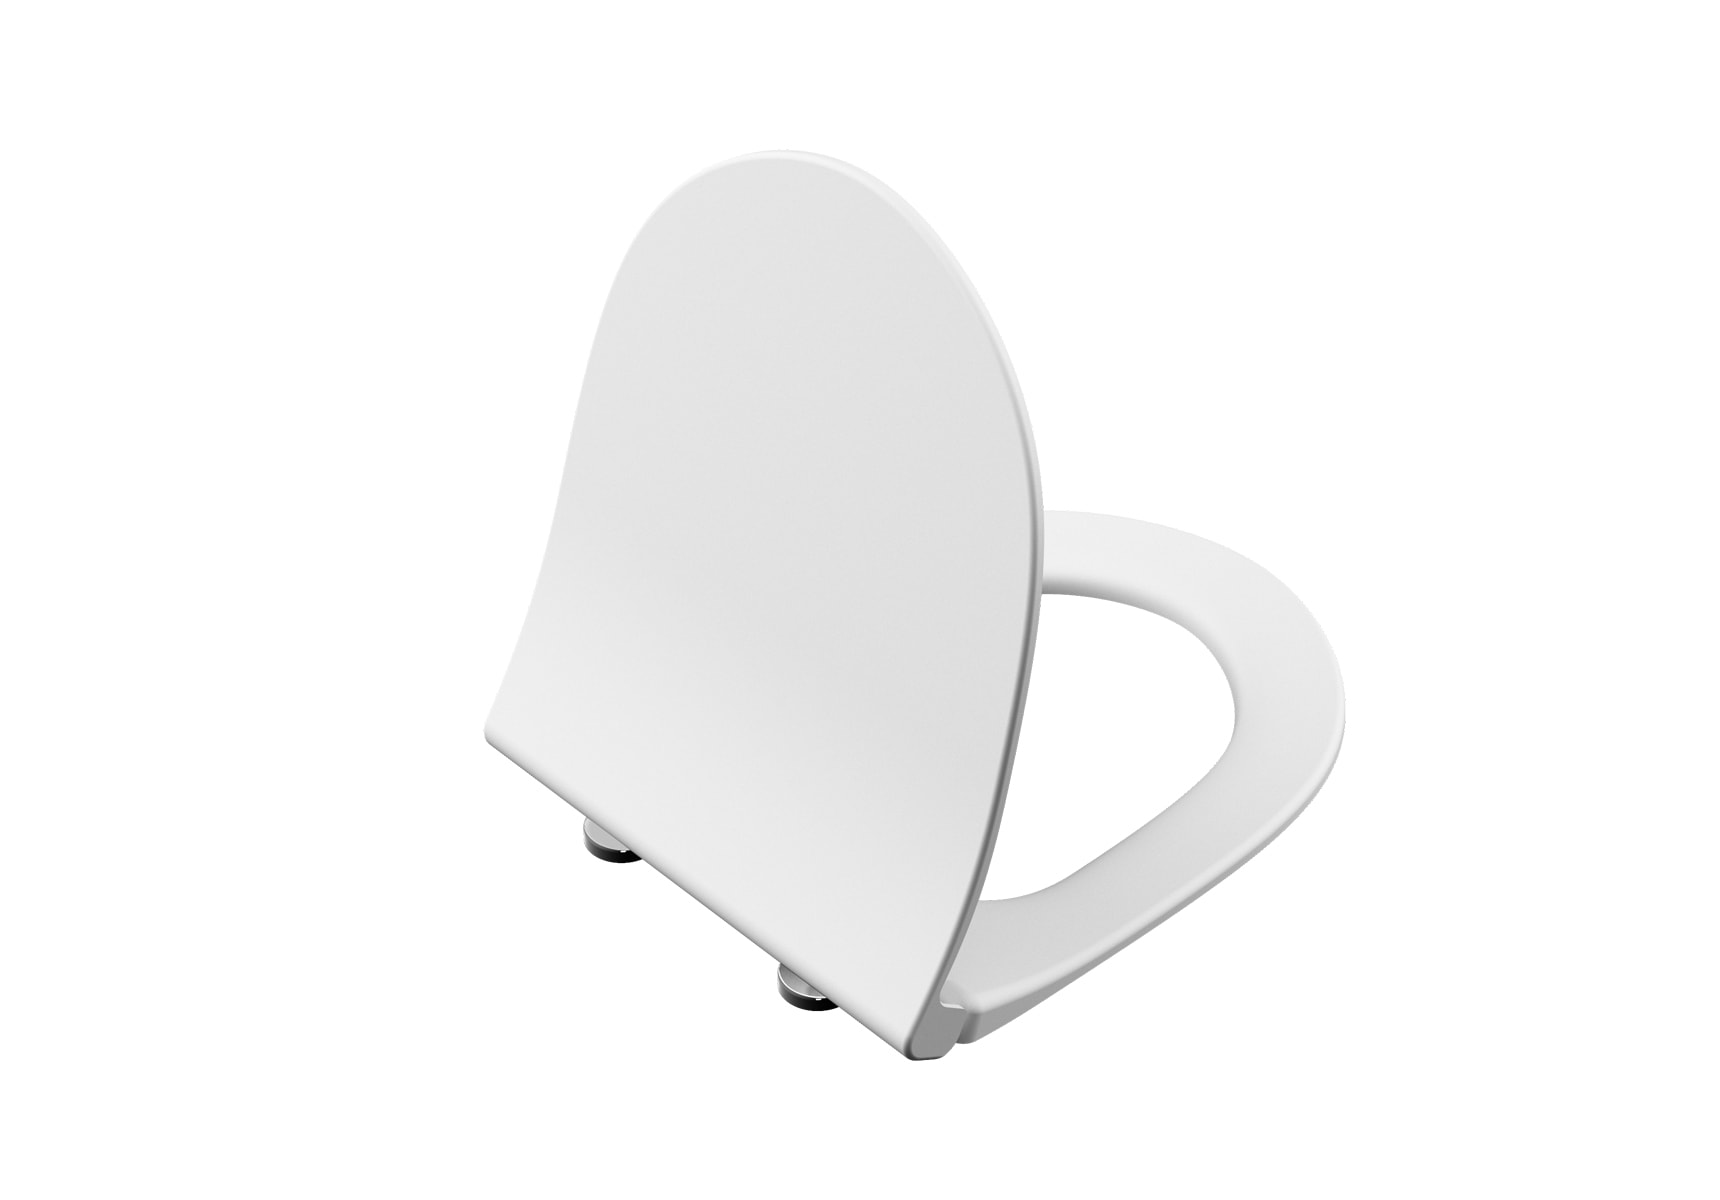 Universal WC Seat-Round Form, Soft Closing